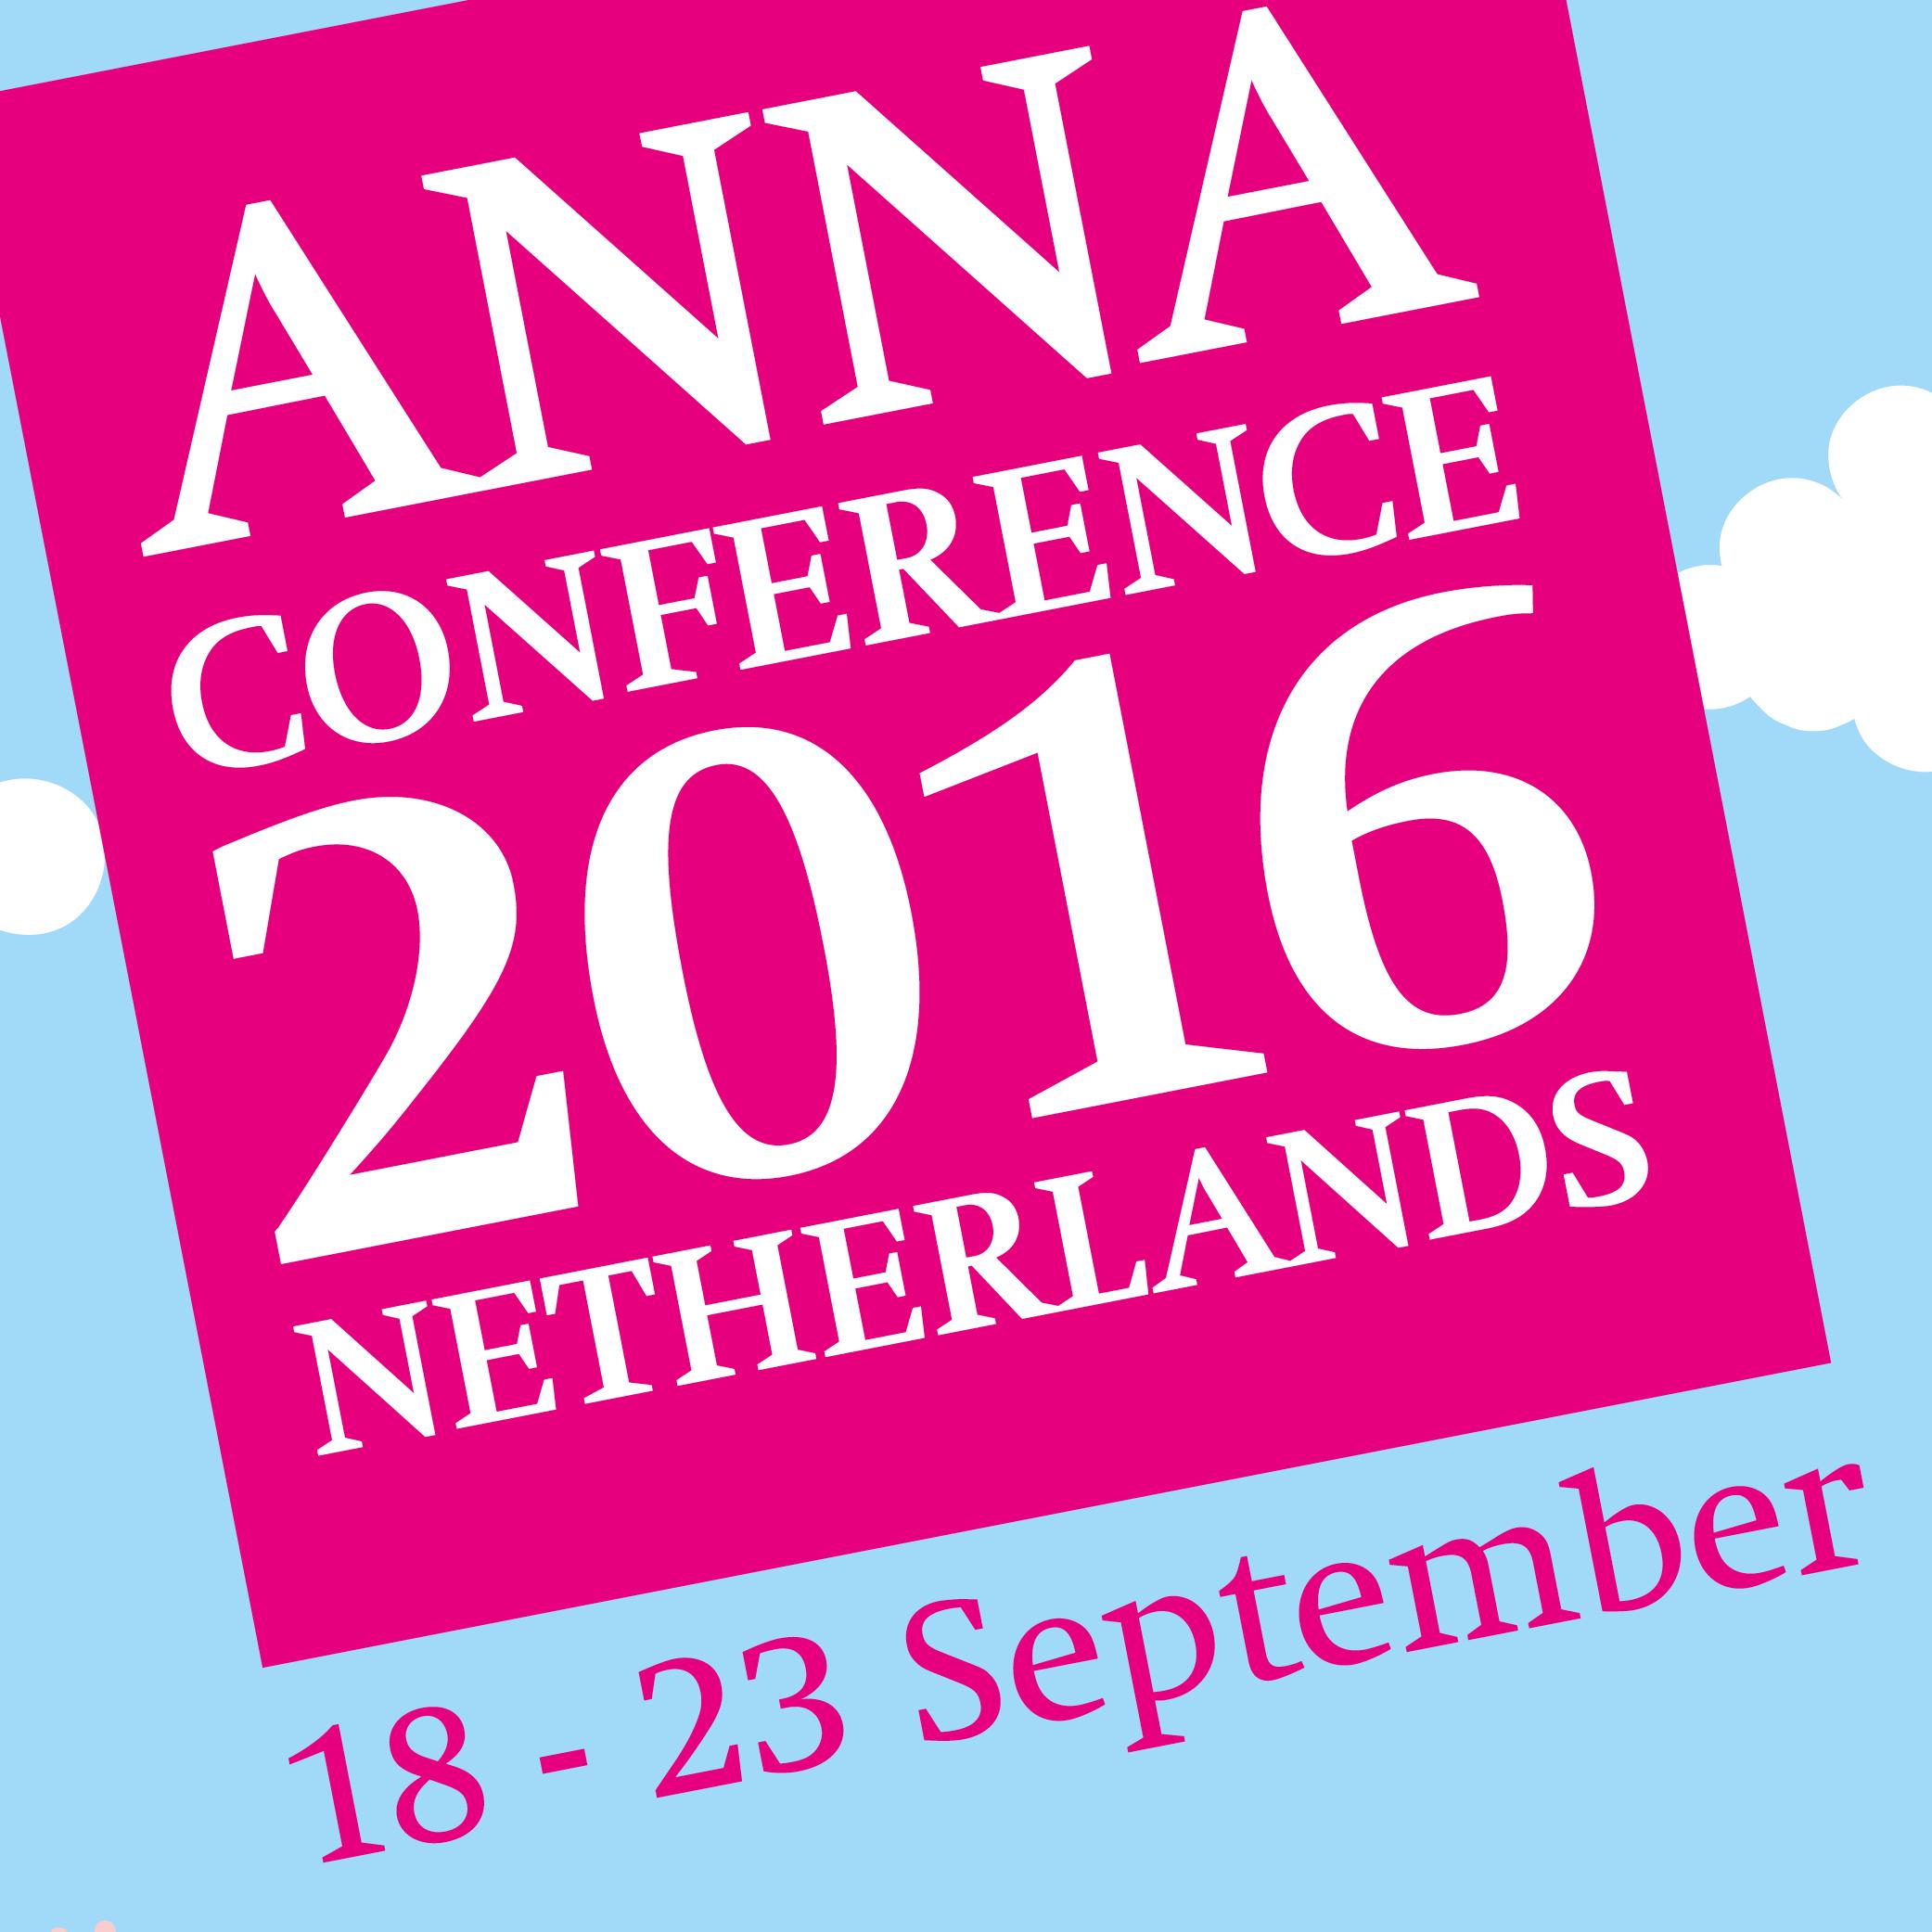 OCI Nitrogen – Anna Conference